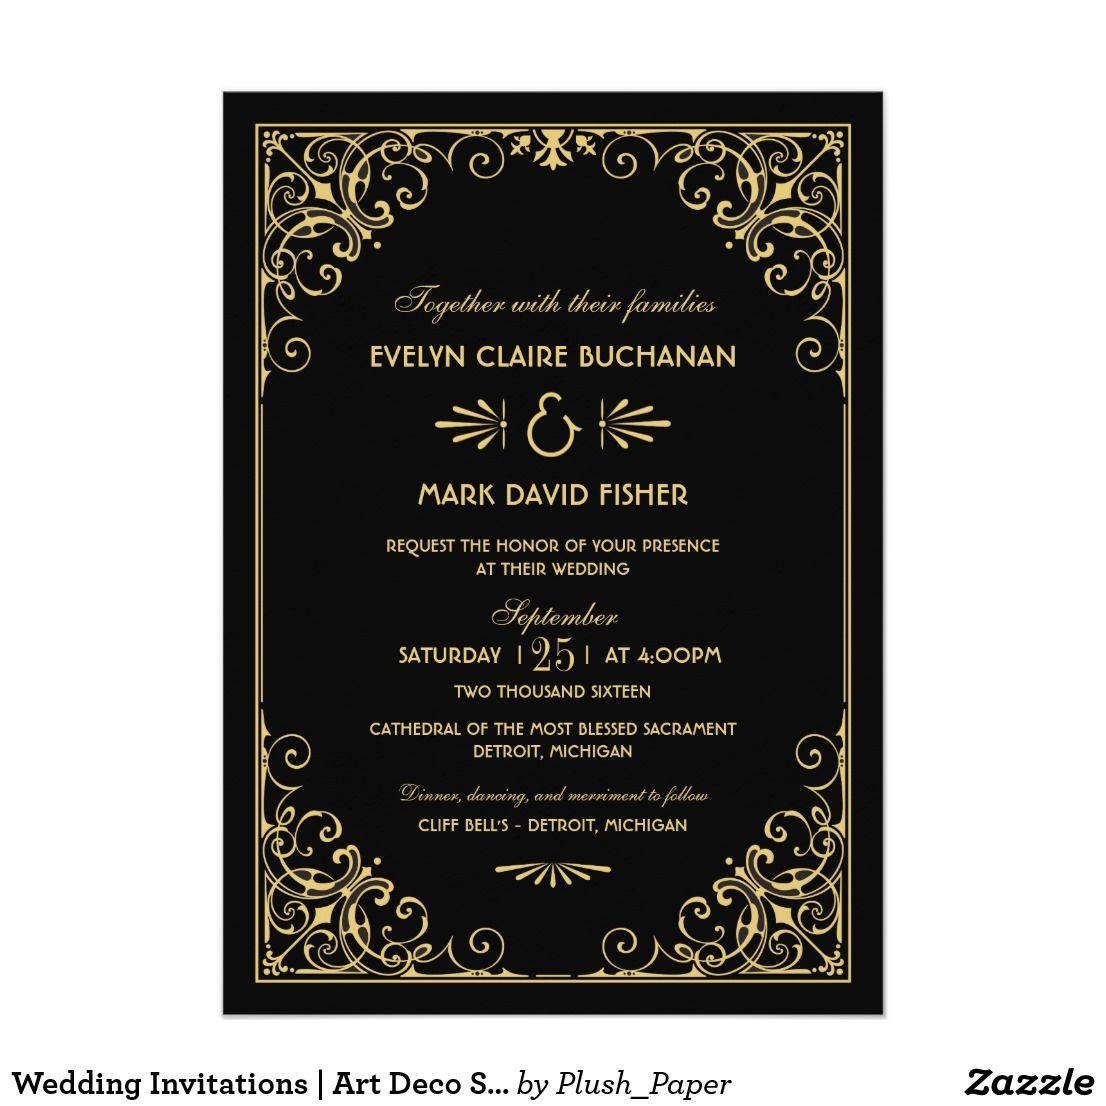 Wedding Invitations   Art Deco Style